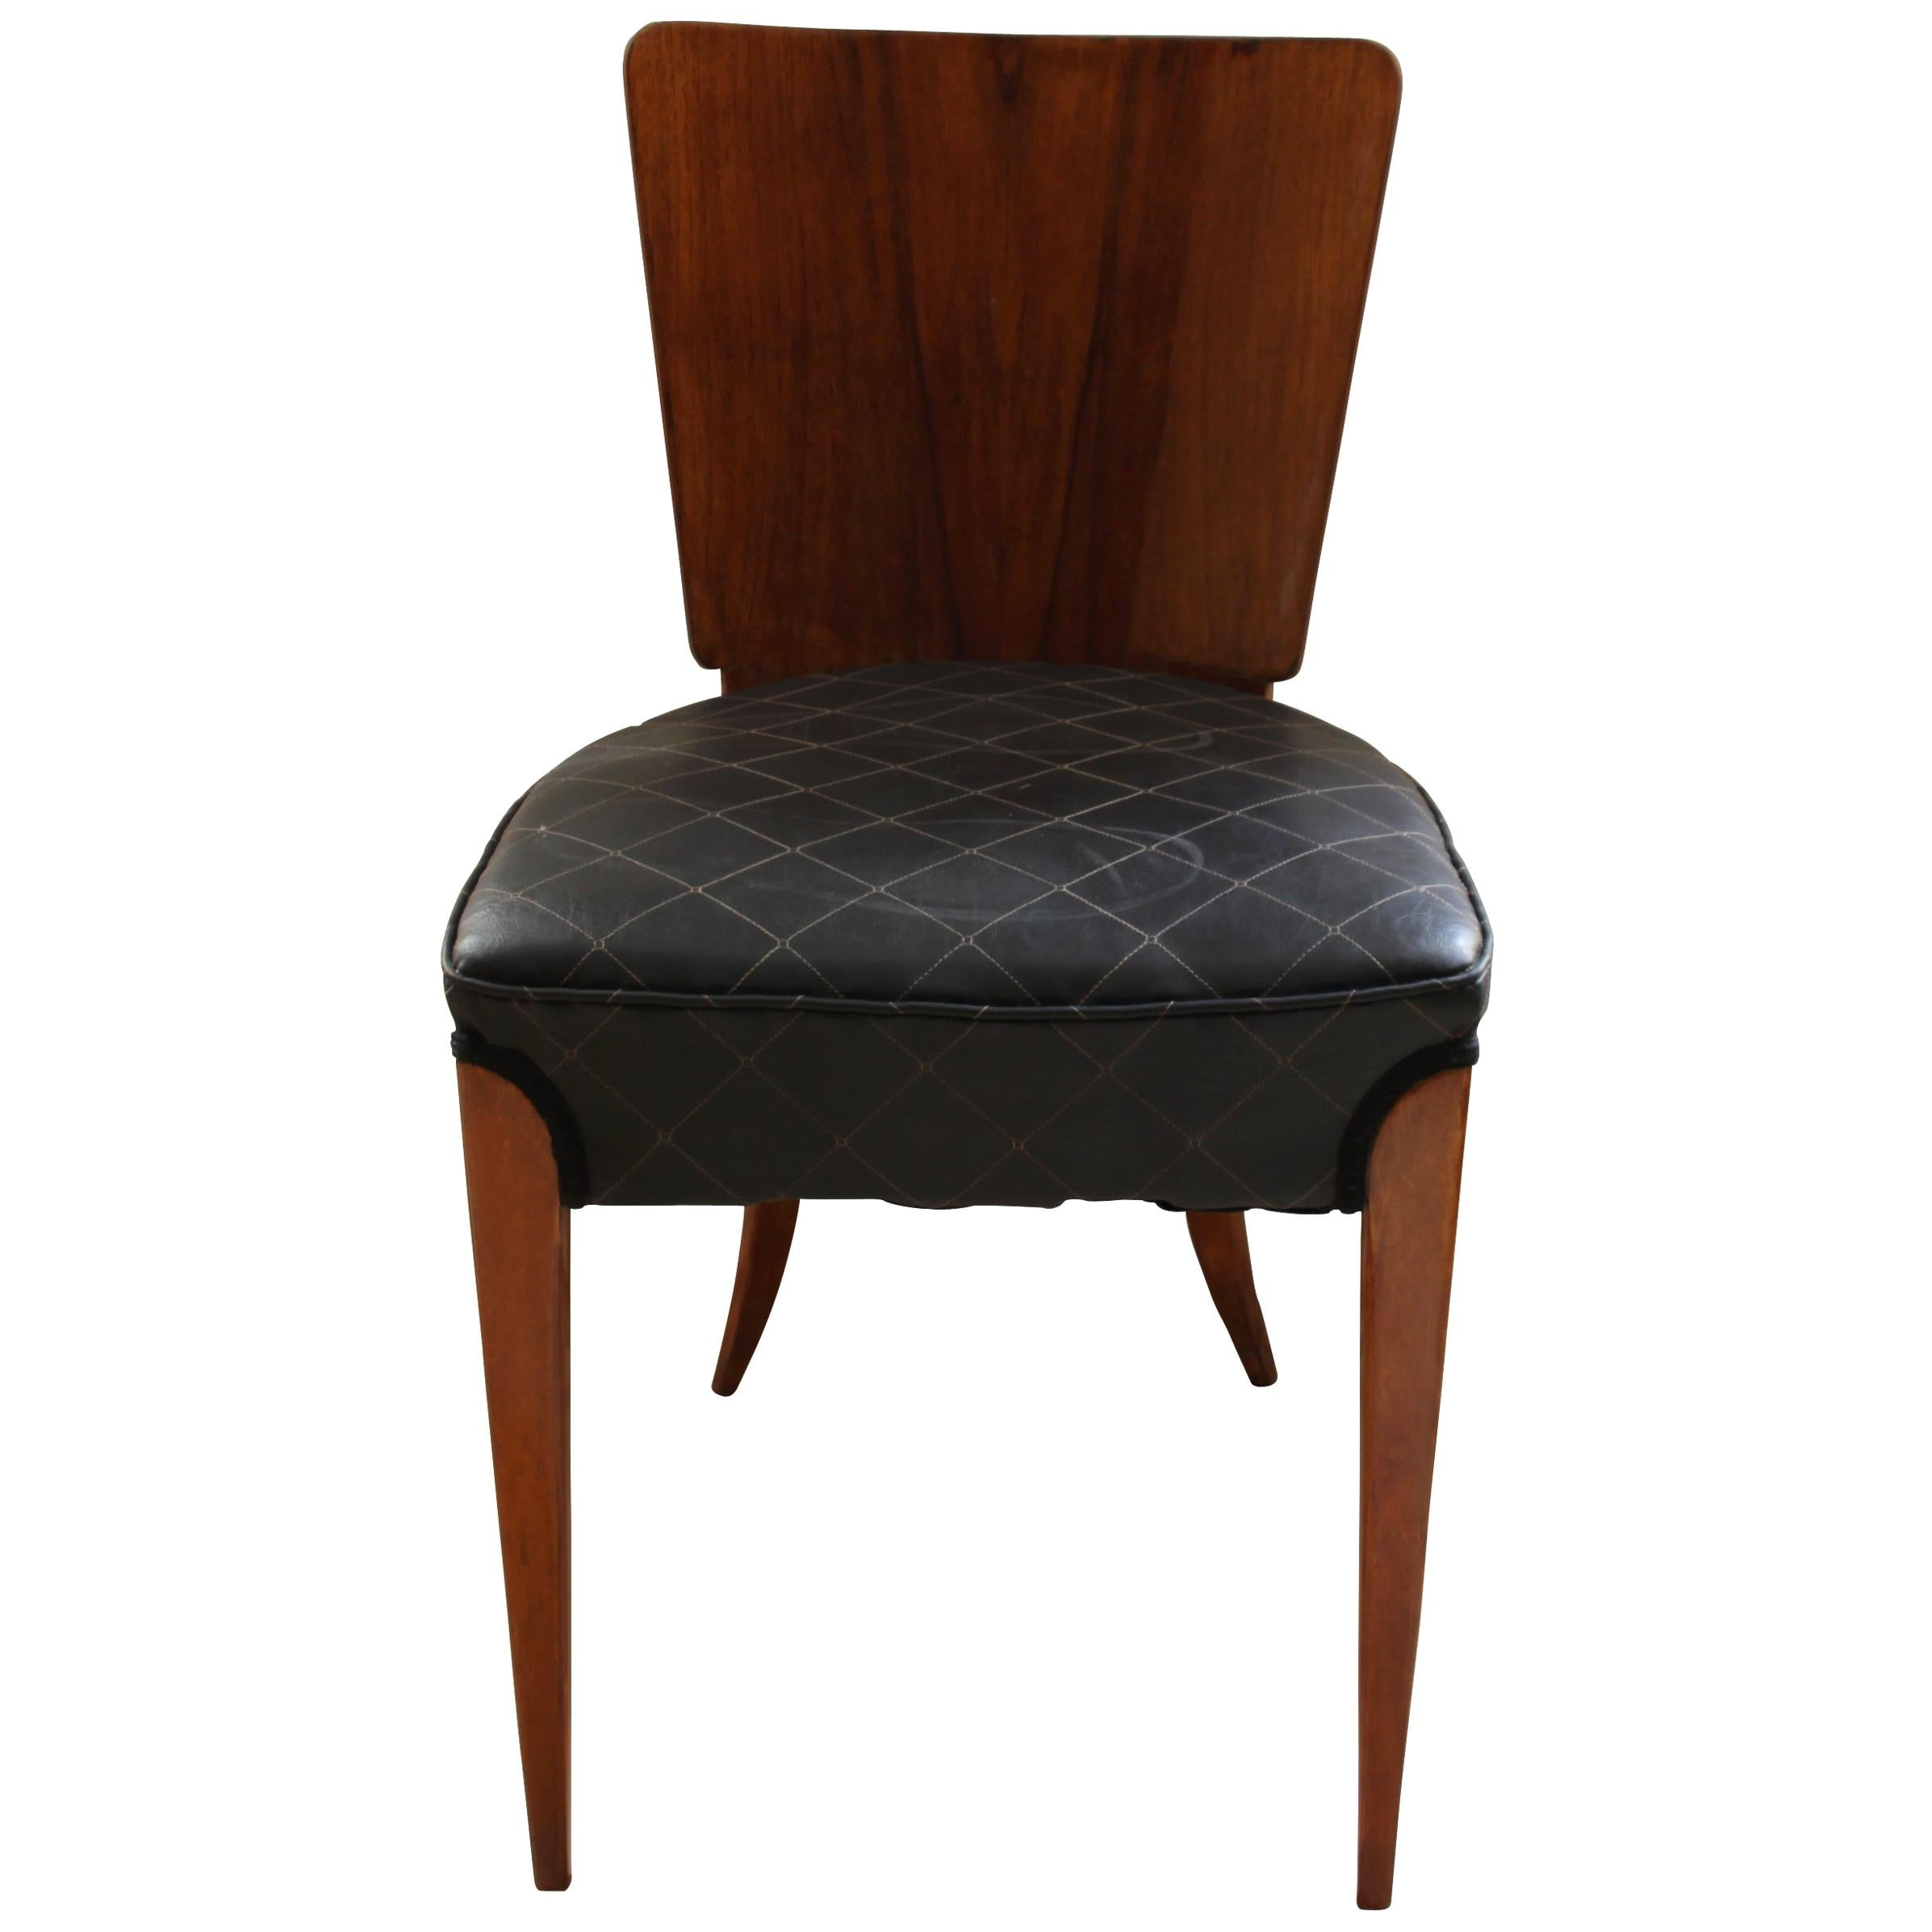 Pair of J. Halabala's H214 Chairs, Walnut Veneer, French Polish, Czech, 1930s